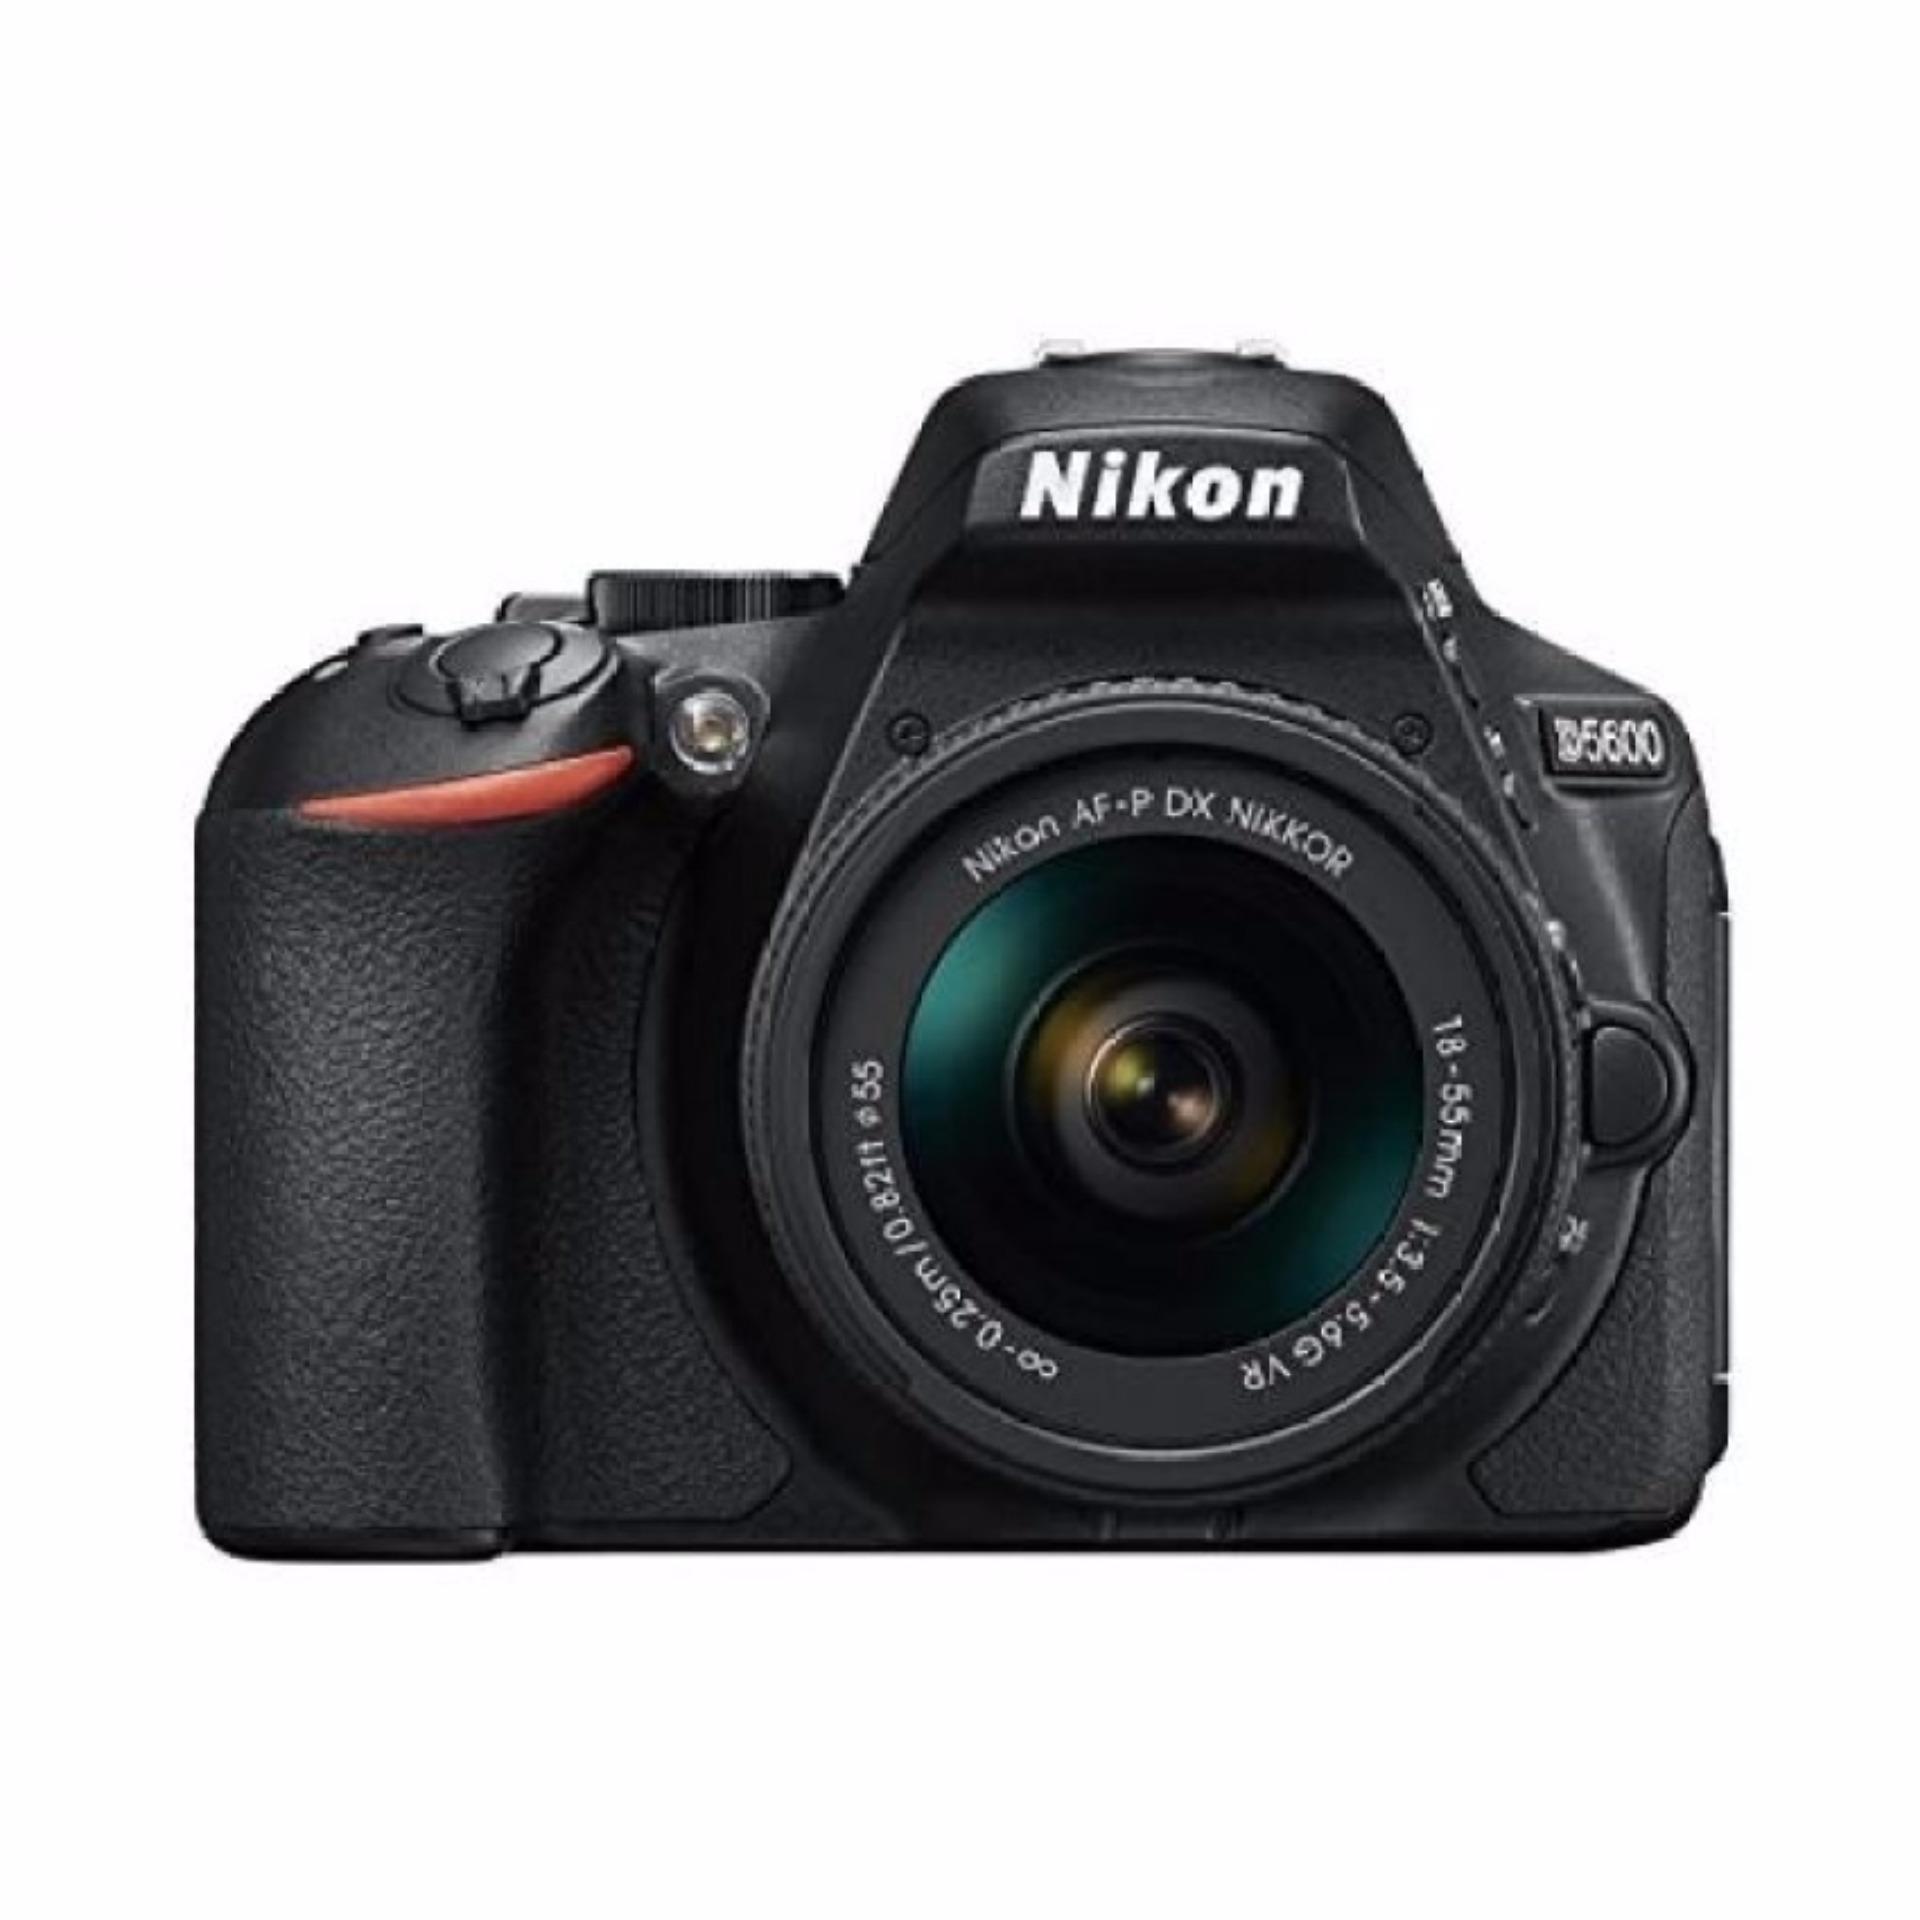 Nikon D5600 DSLR Camera with 18-55mm +70-300mm G twin Lens kit export only(Black)